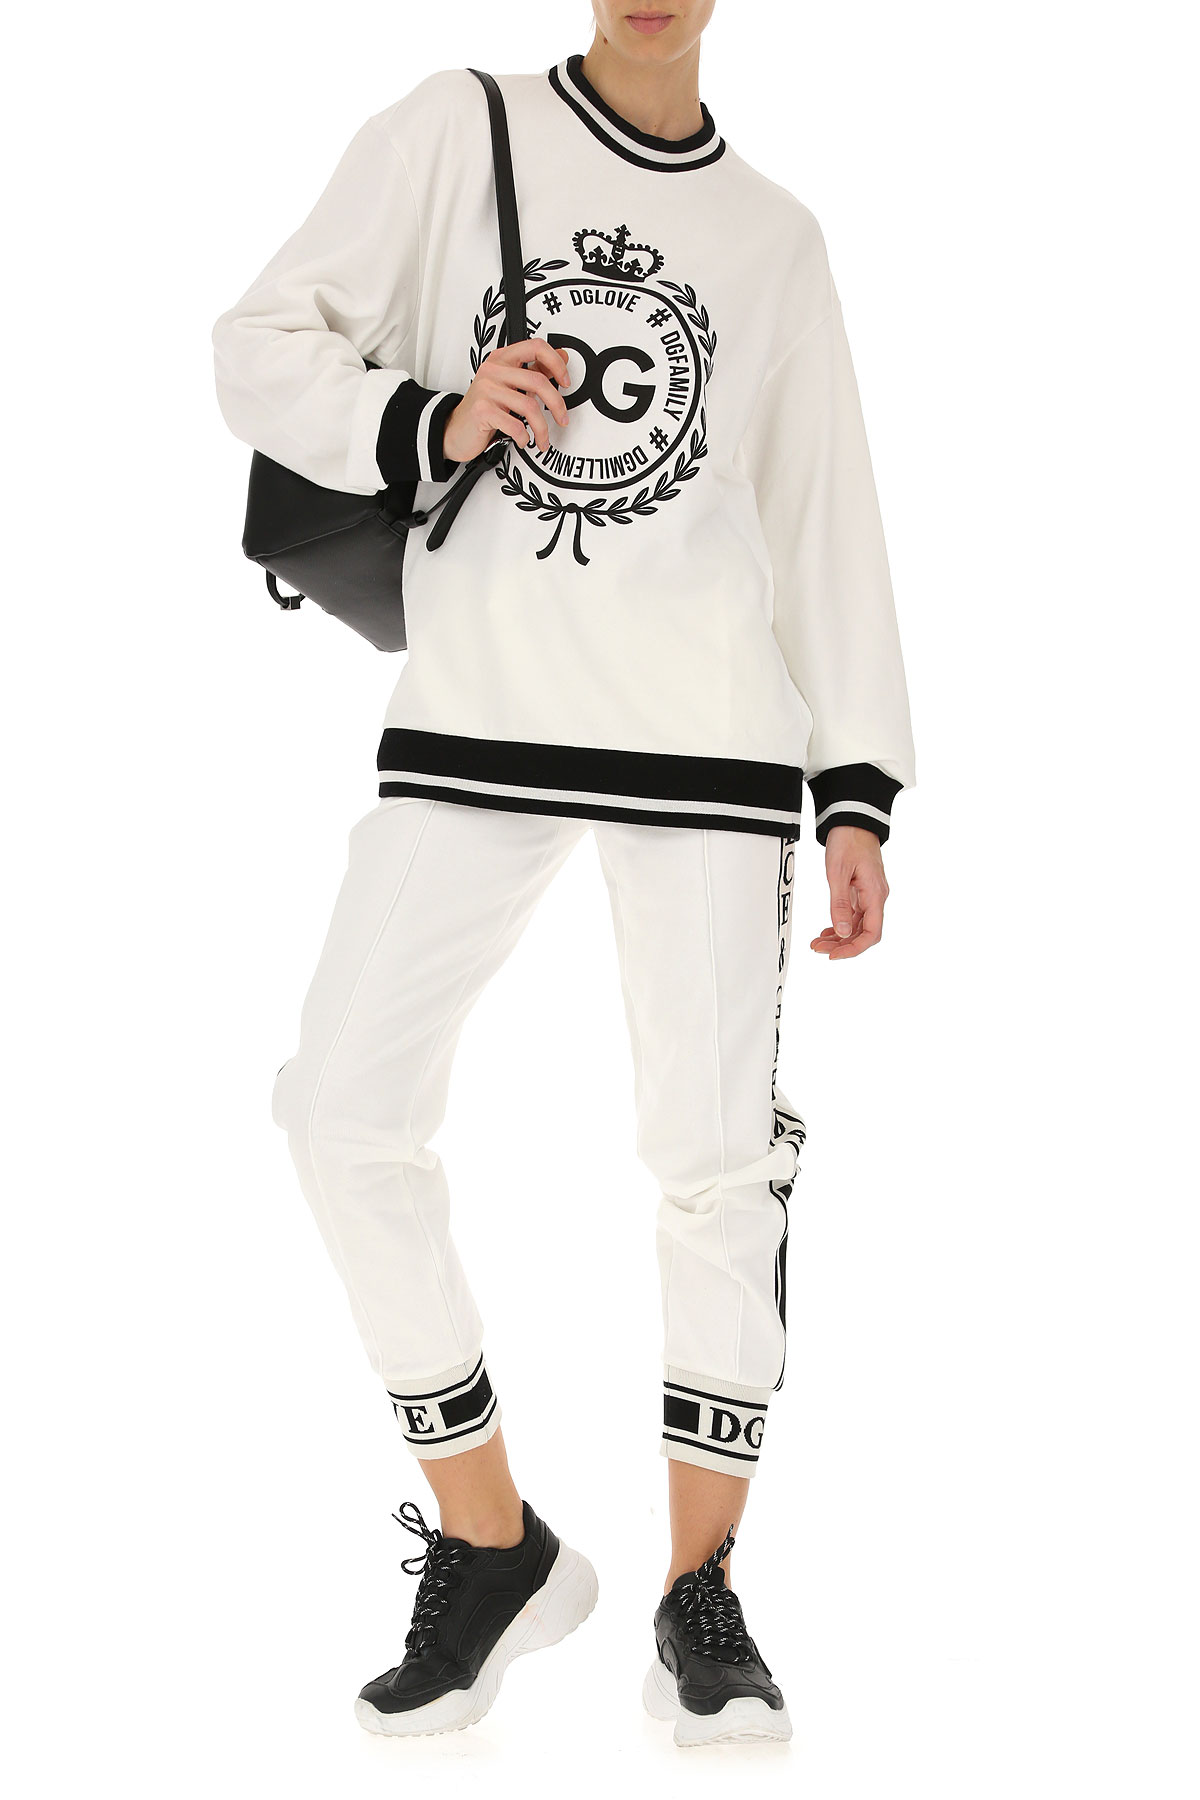 Blanco Gabbana Para Dolce amp; Negro Ropa Mujer 2019 Primavera verano q5S8aSnw